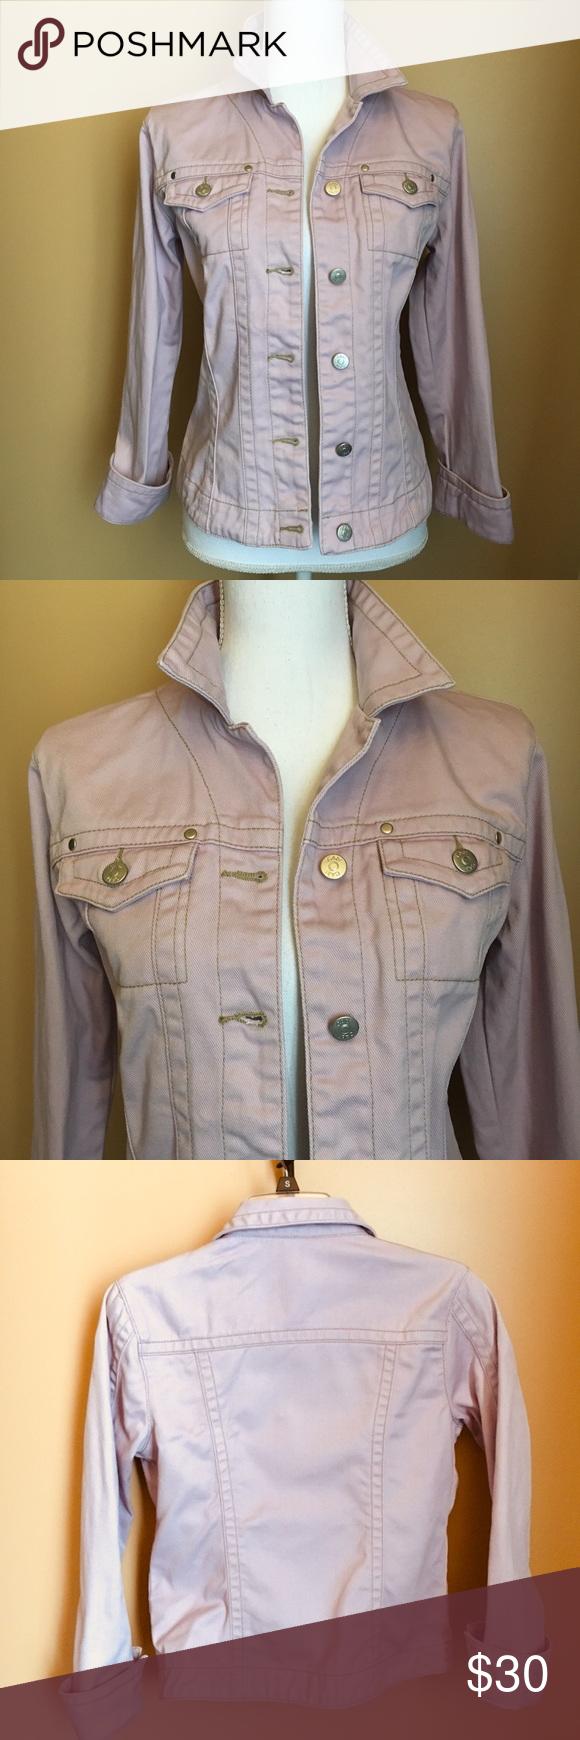 Cabi Lavender Jean Jacket Style 253 Cotton Denim Jean Jacket Styles Lavender Jeans Jackets [ 1740 x 580 Pixel ]